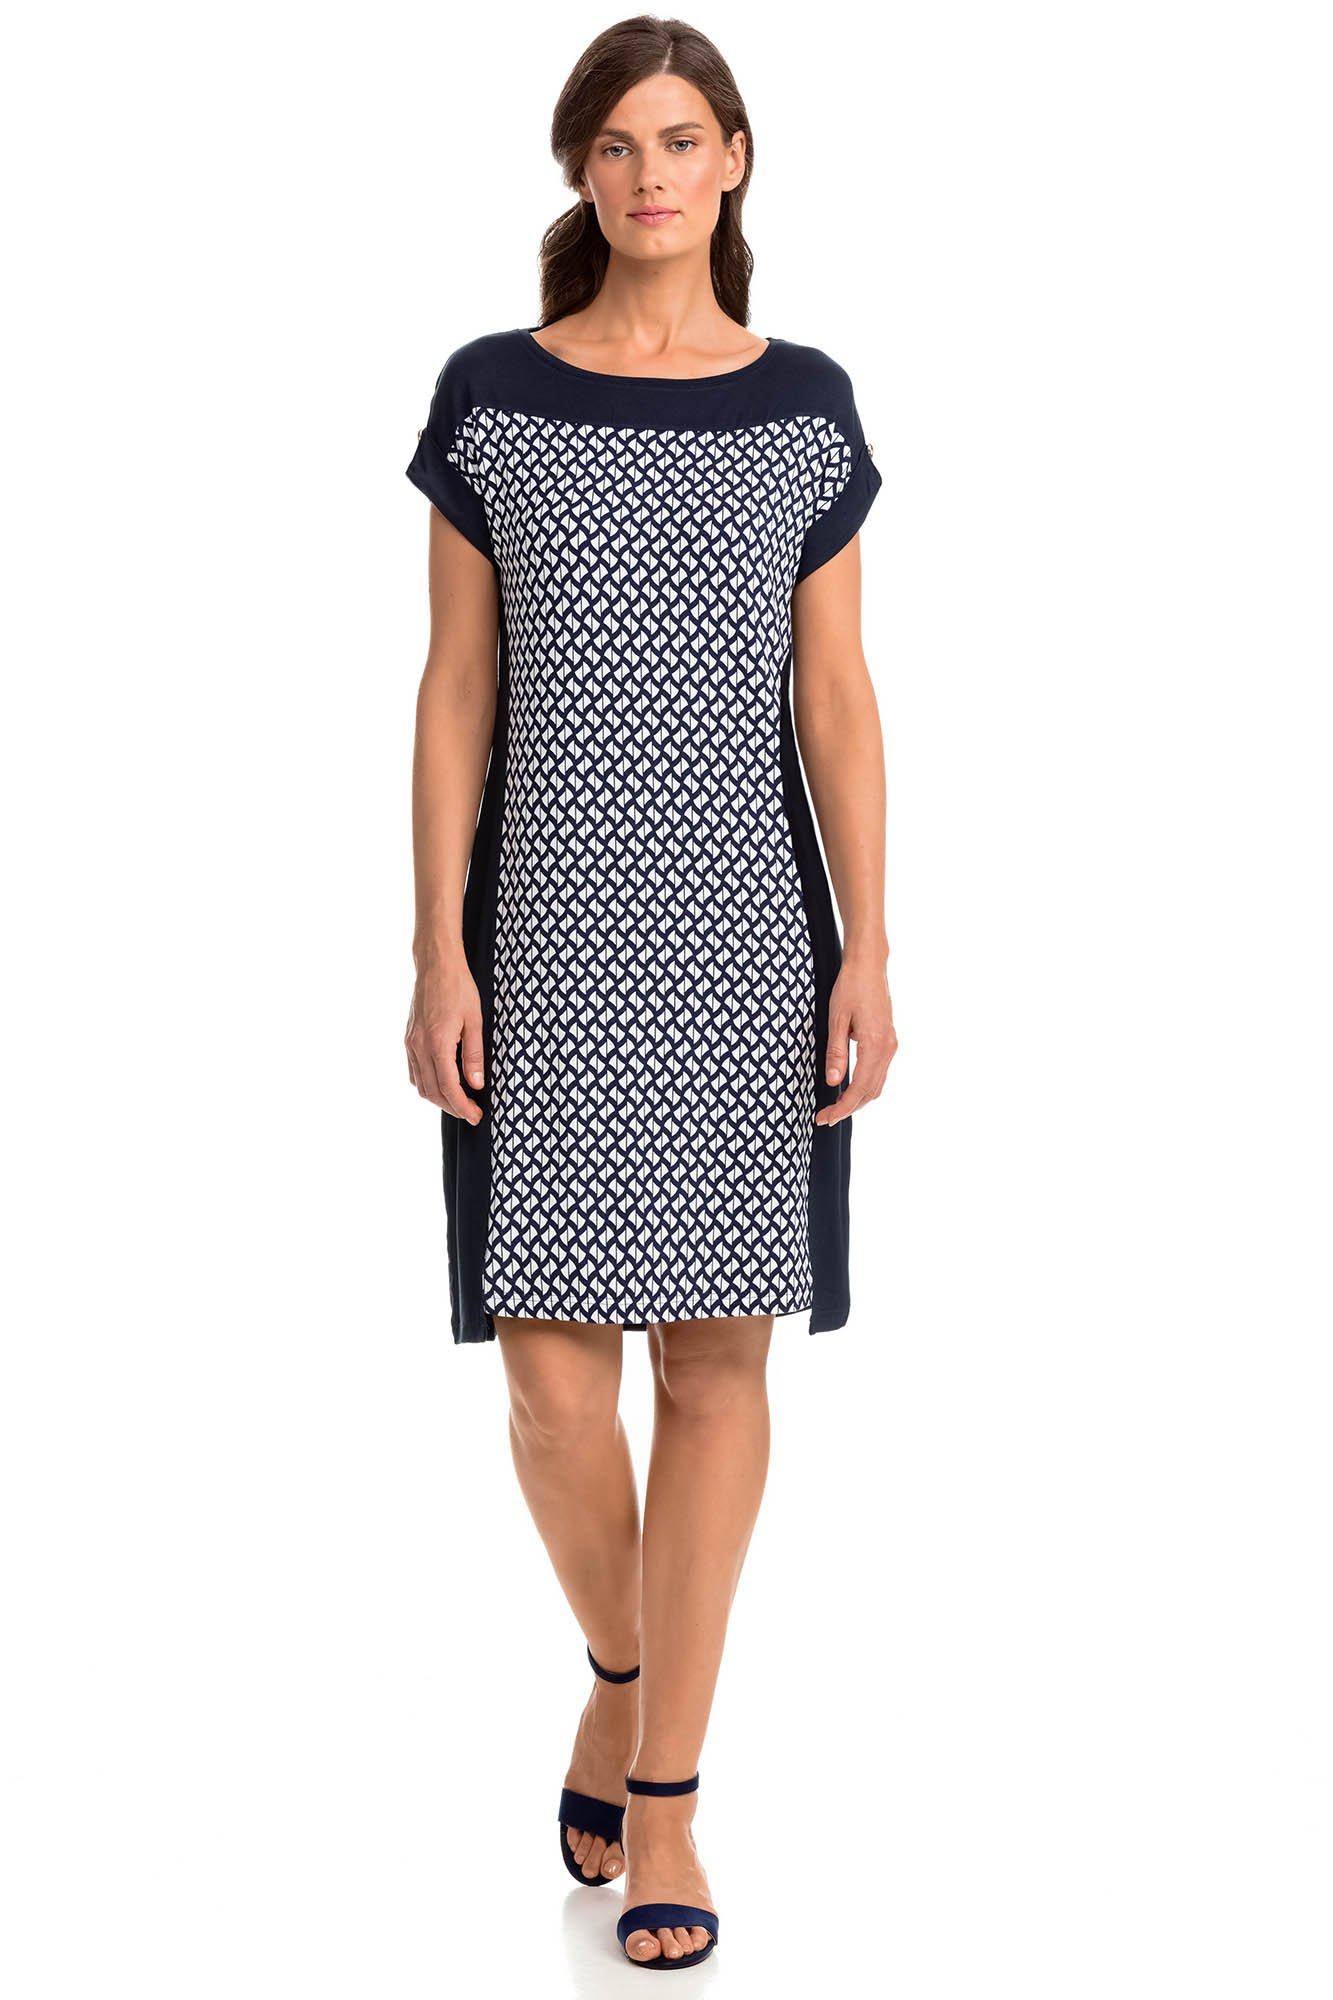 Vamp - Letné dámske šaty 14453 - Vamp blue s